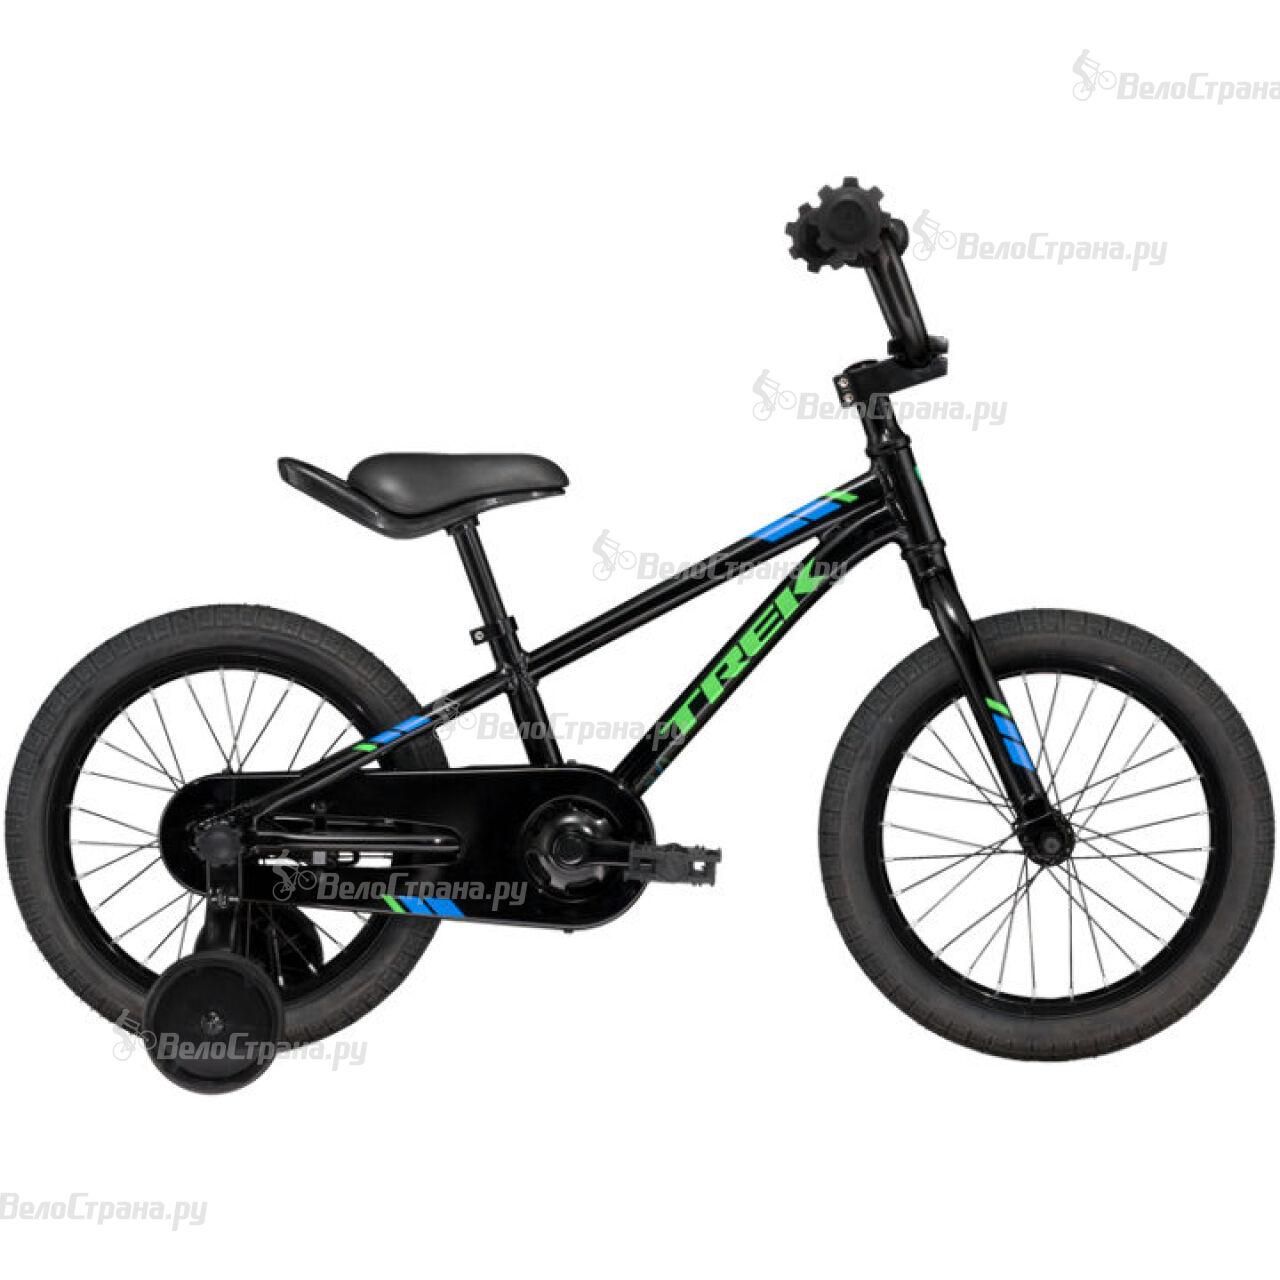 Велосипед Trek Precaliber 16 Boys (2017)